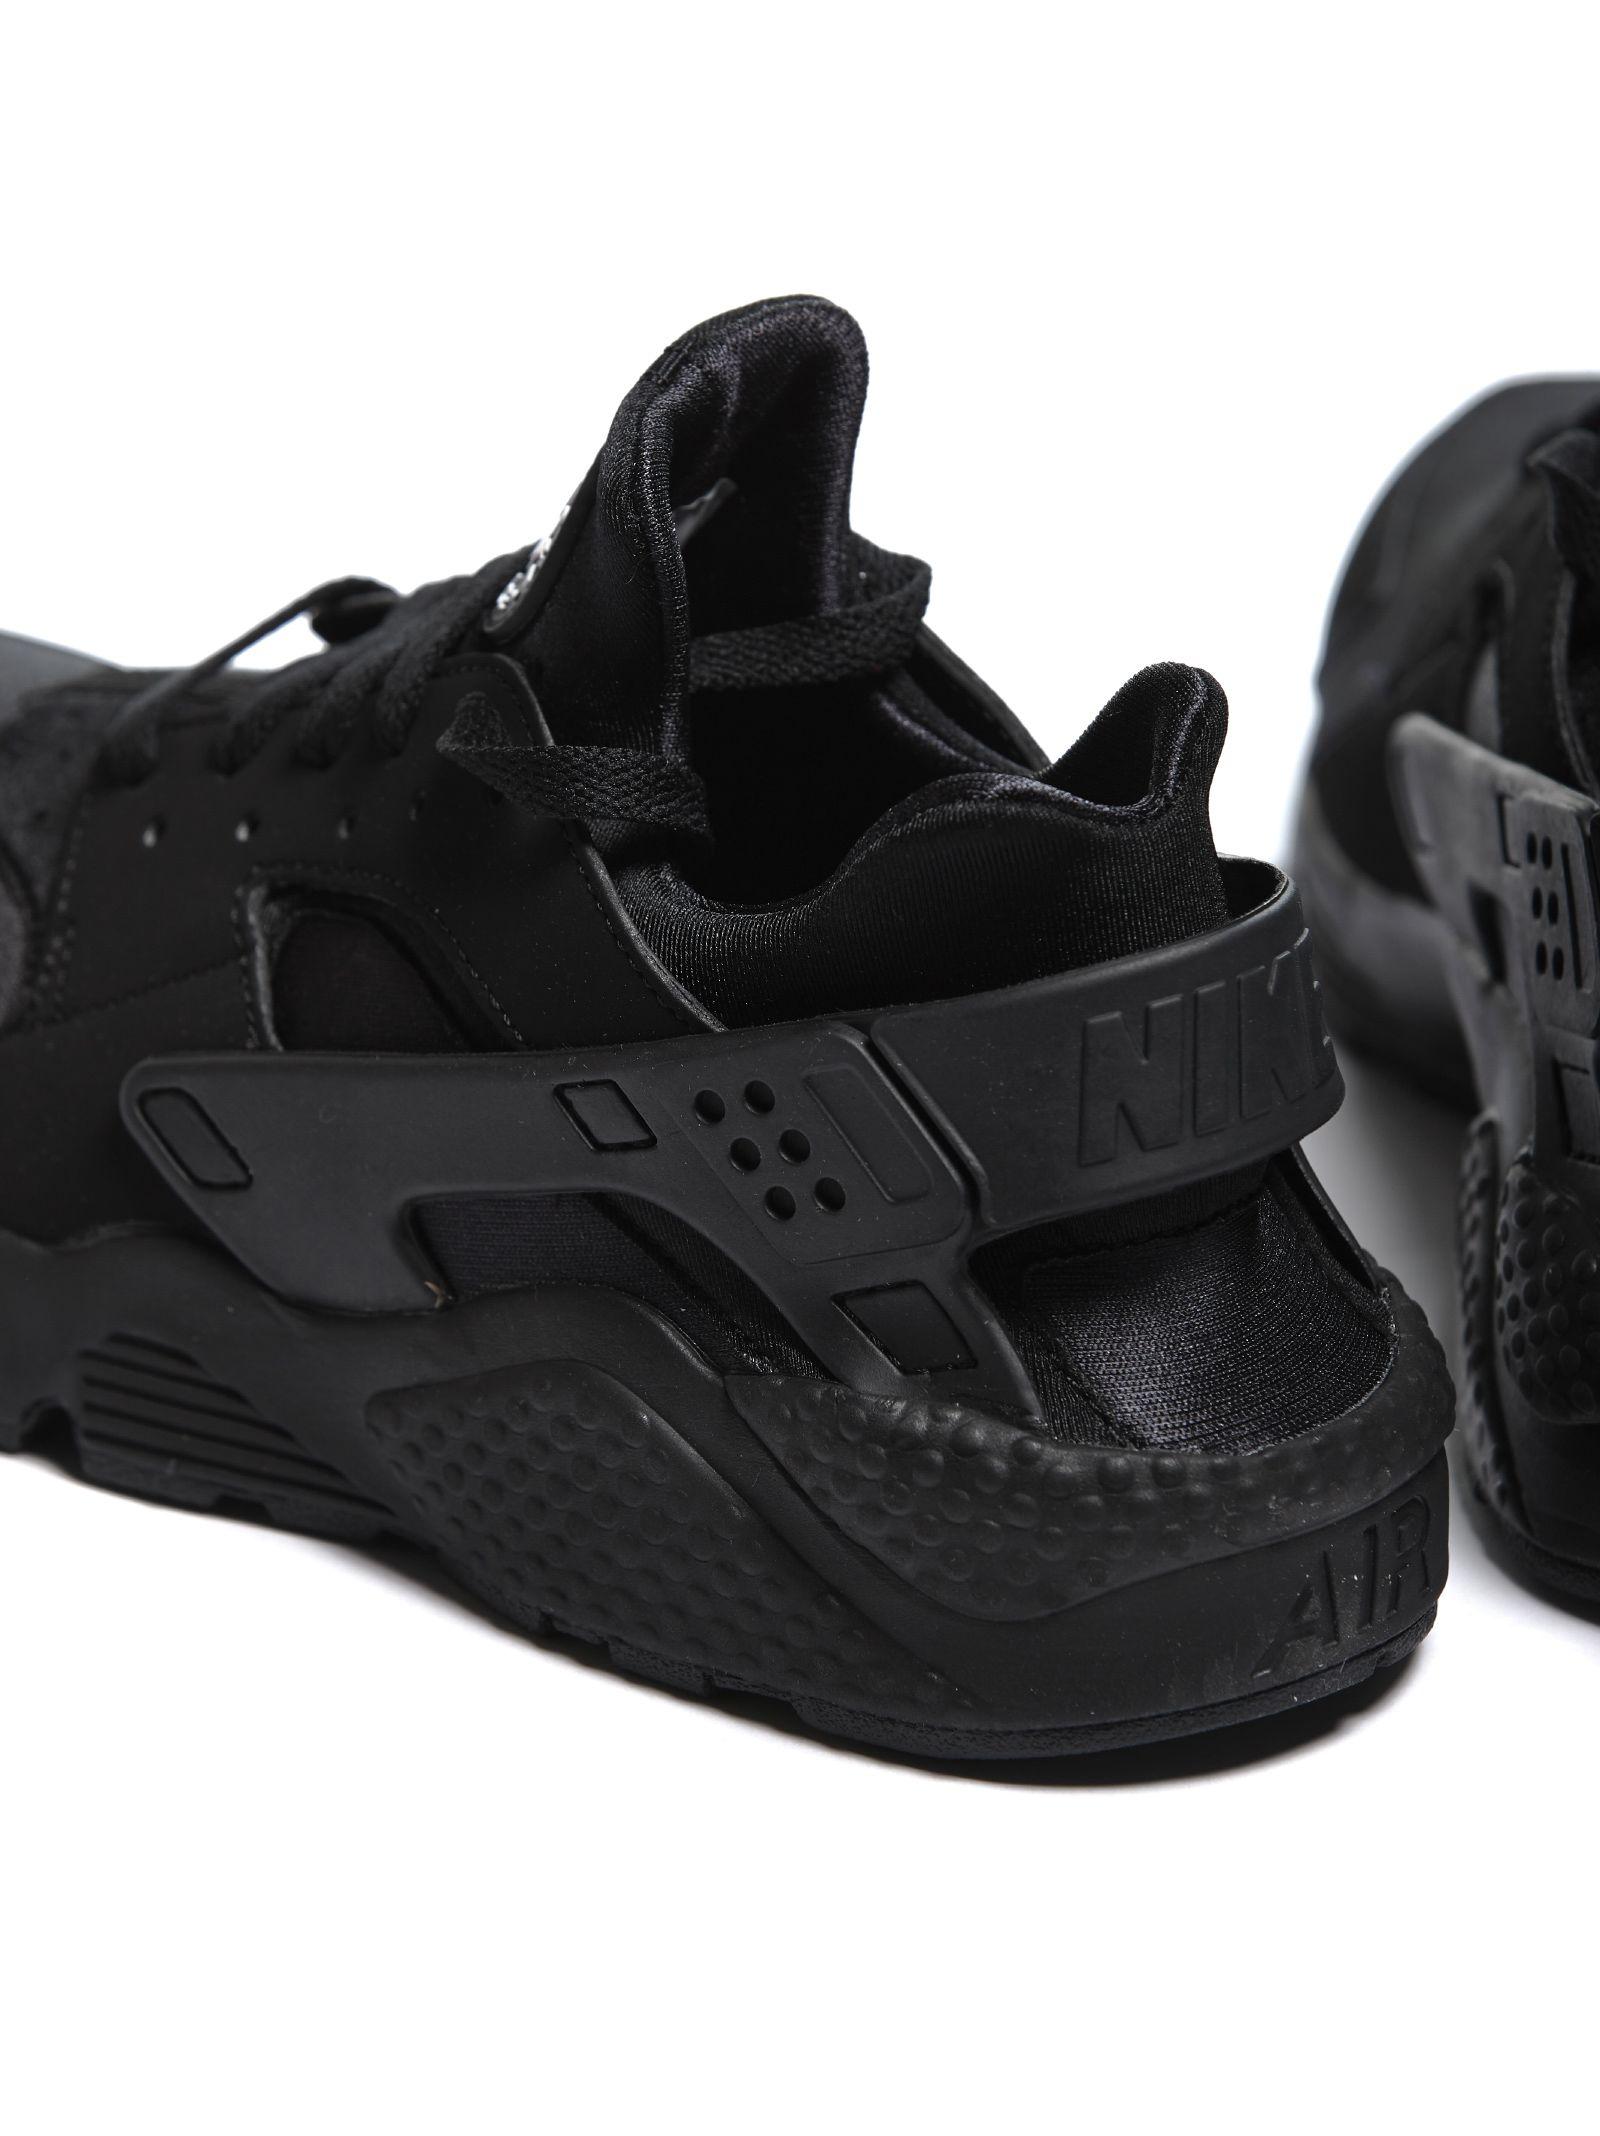 670df6d3617e Nike Nike Air Huarache Essential Id Sneakers - Black - 10646551 ...